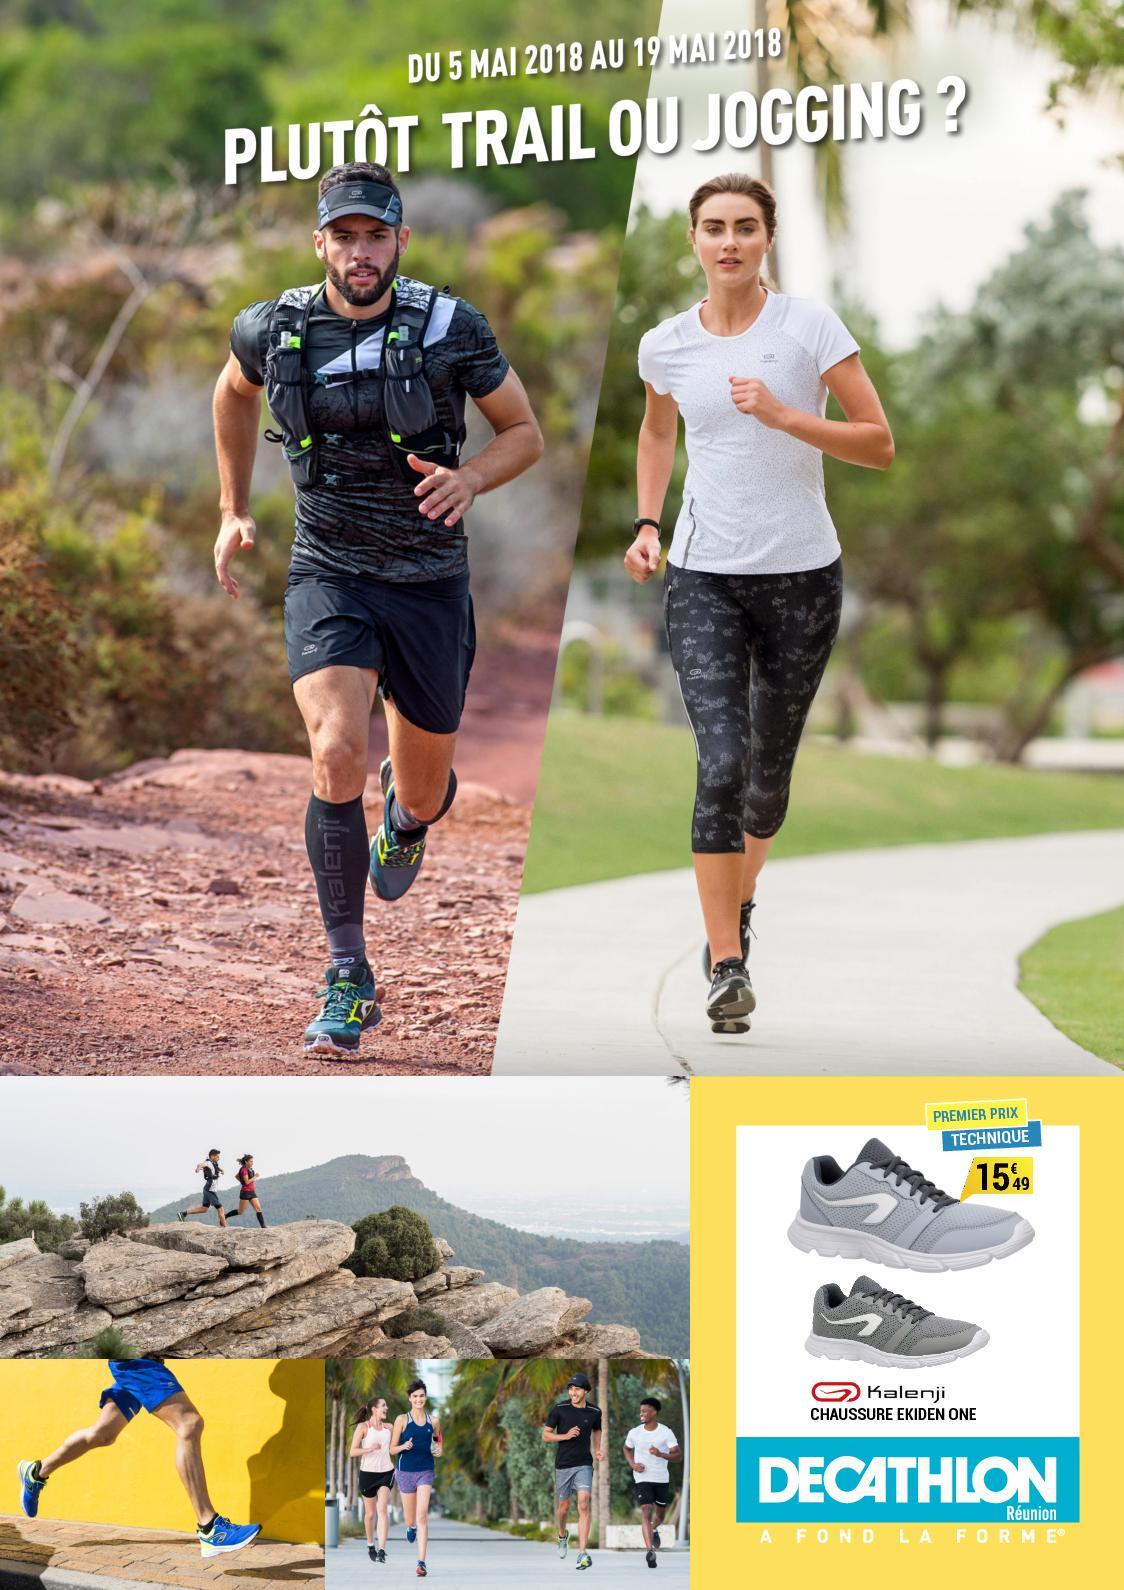 323bef22070f Calaméo - Plutot trail ou jogging